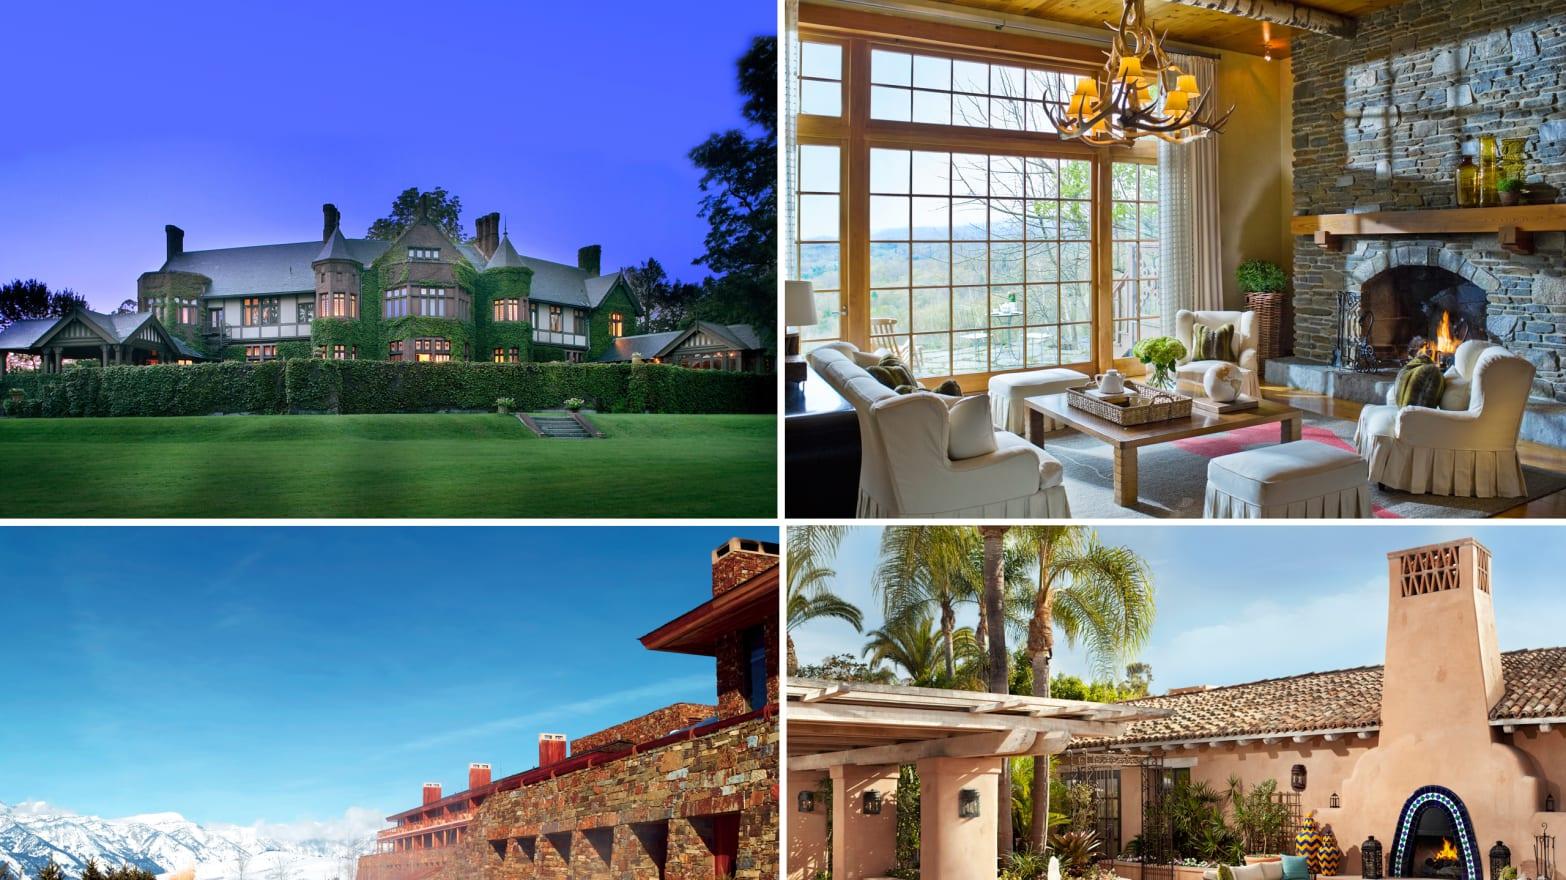 Top 20 U.S. Small Hotels: Andrew Harper's Picks (Photos)